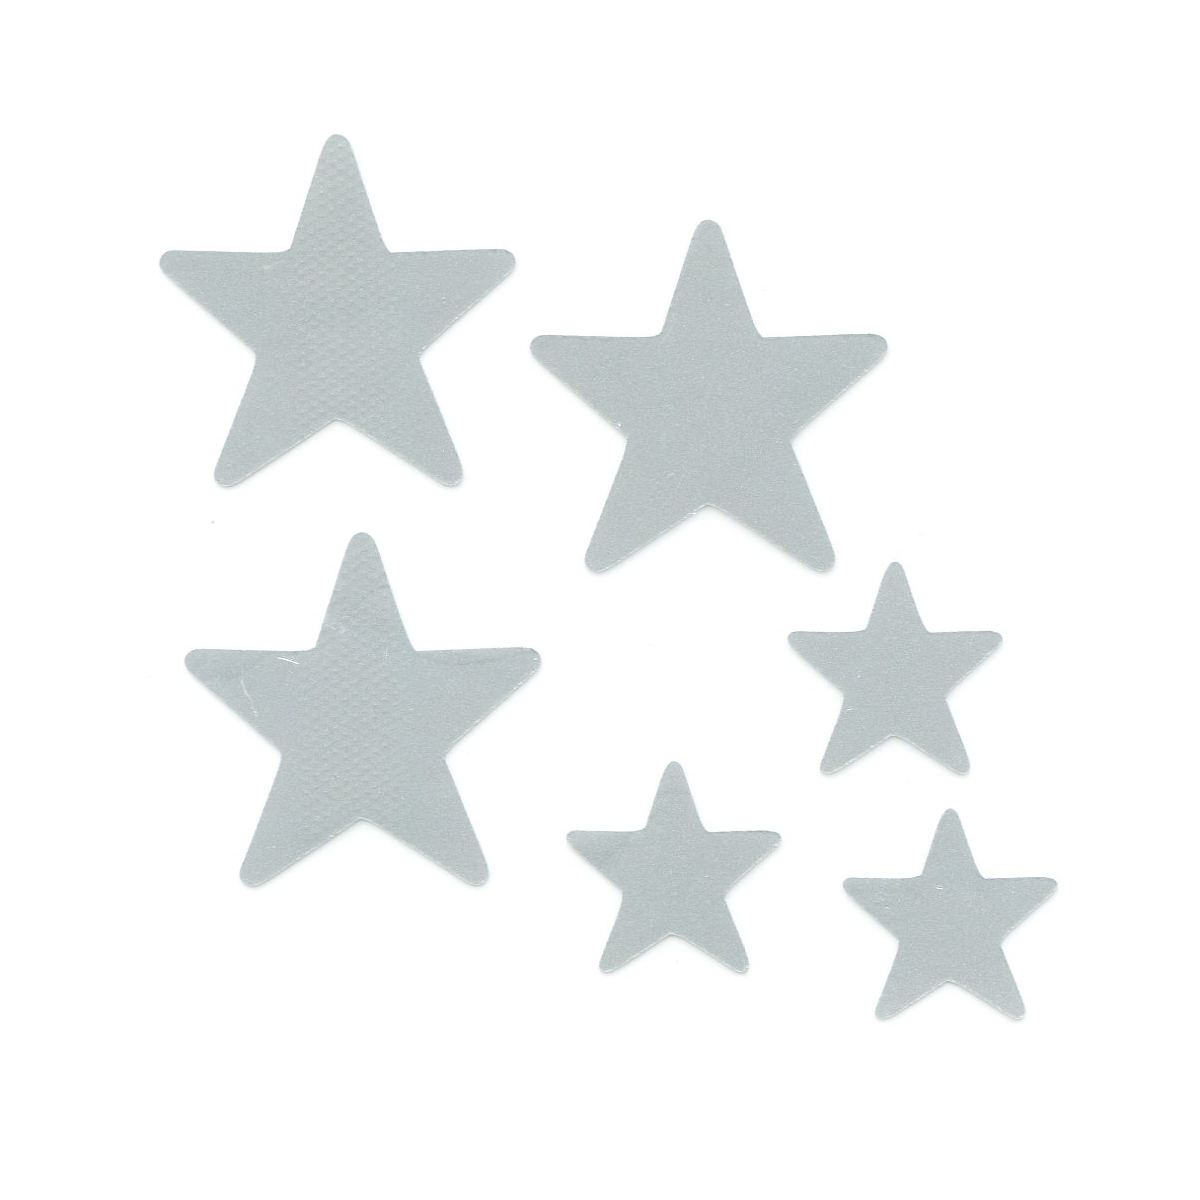 Набор светоотражающих наклеек Bestex Звезды набор шкатулок для рукоделия bestex 3 шт zw001250